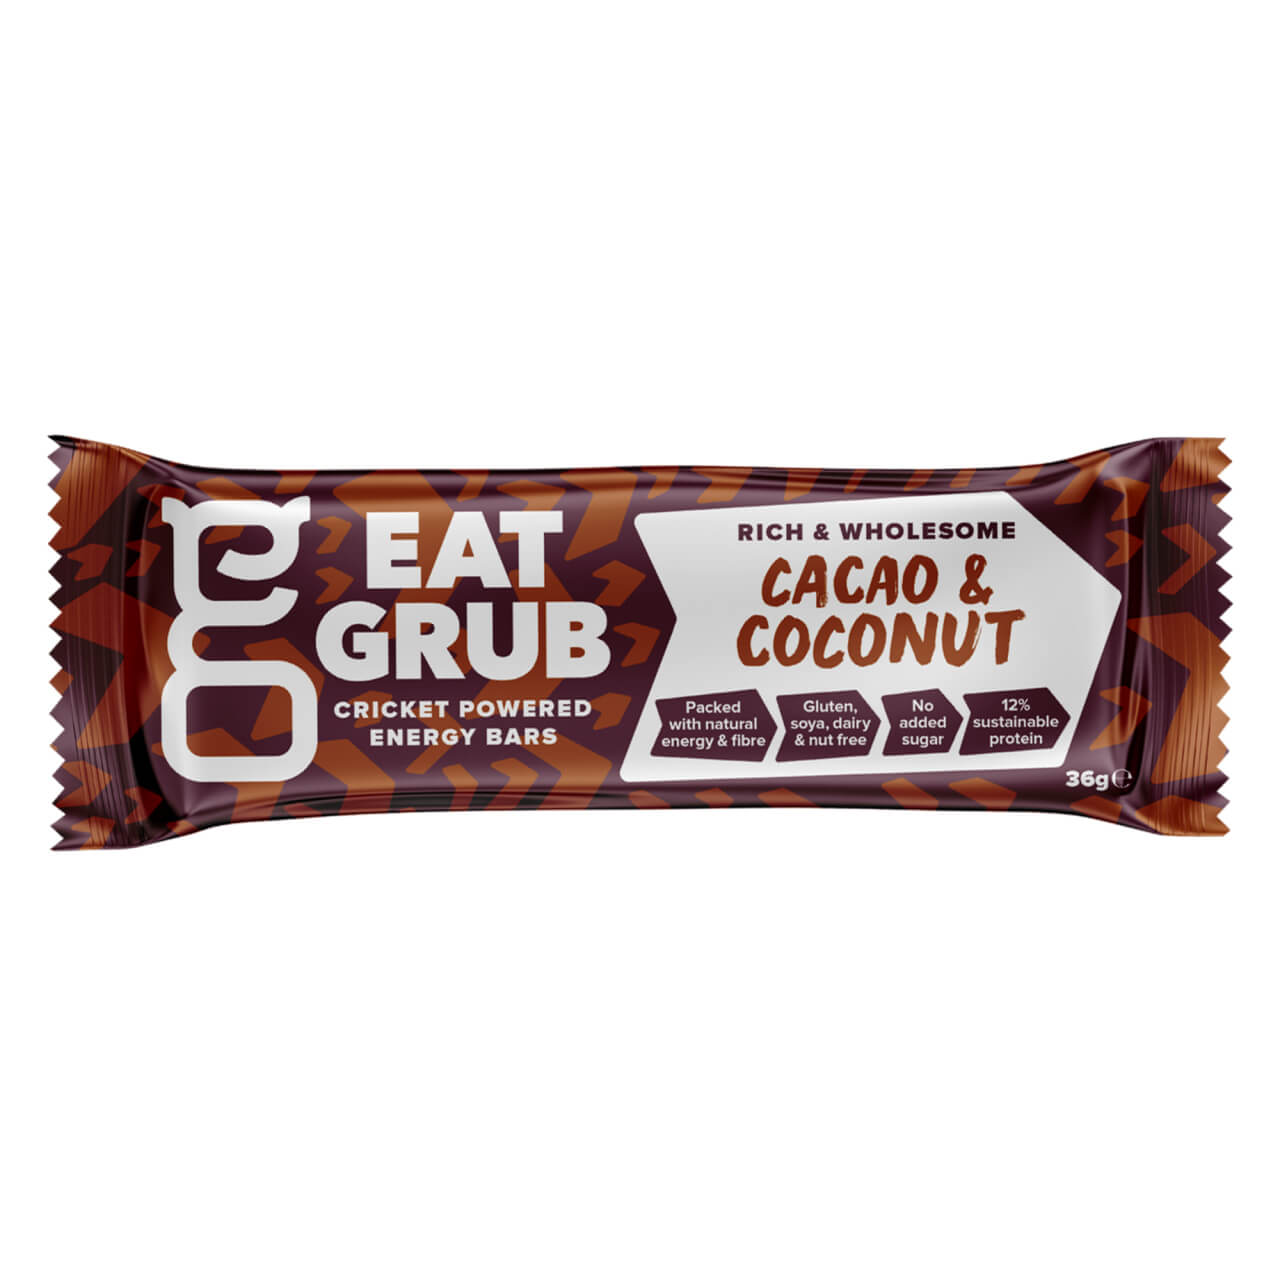 Eat Grub bar カカオ&ココナッツ 1ケース12本入